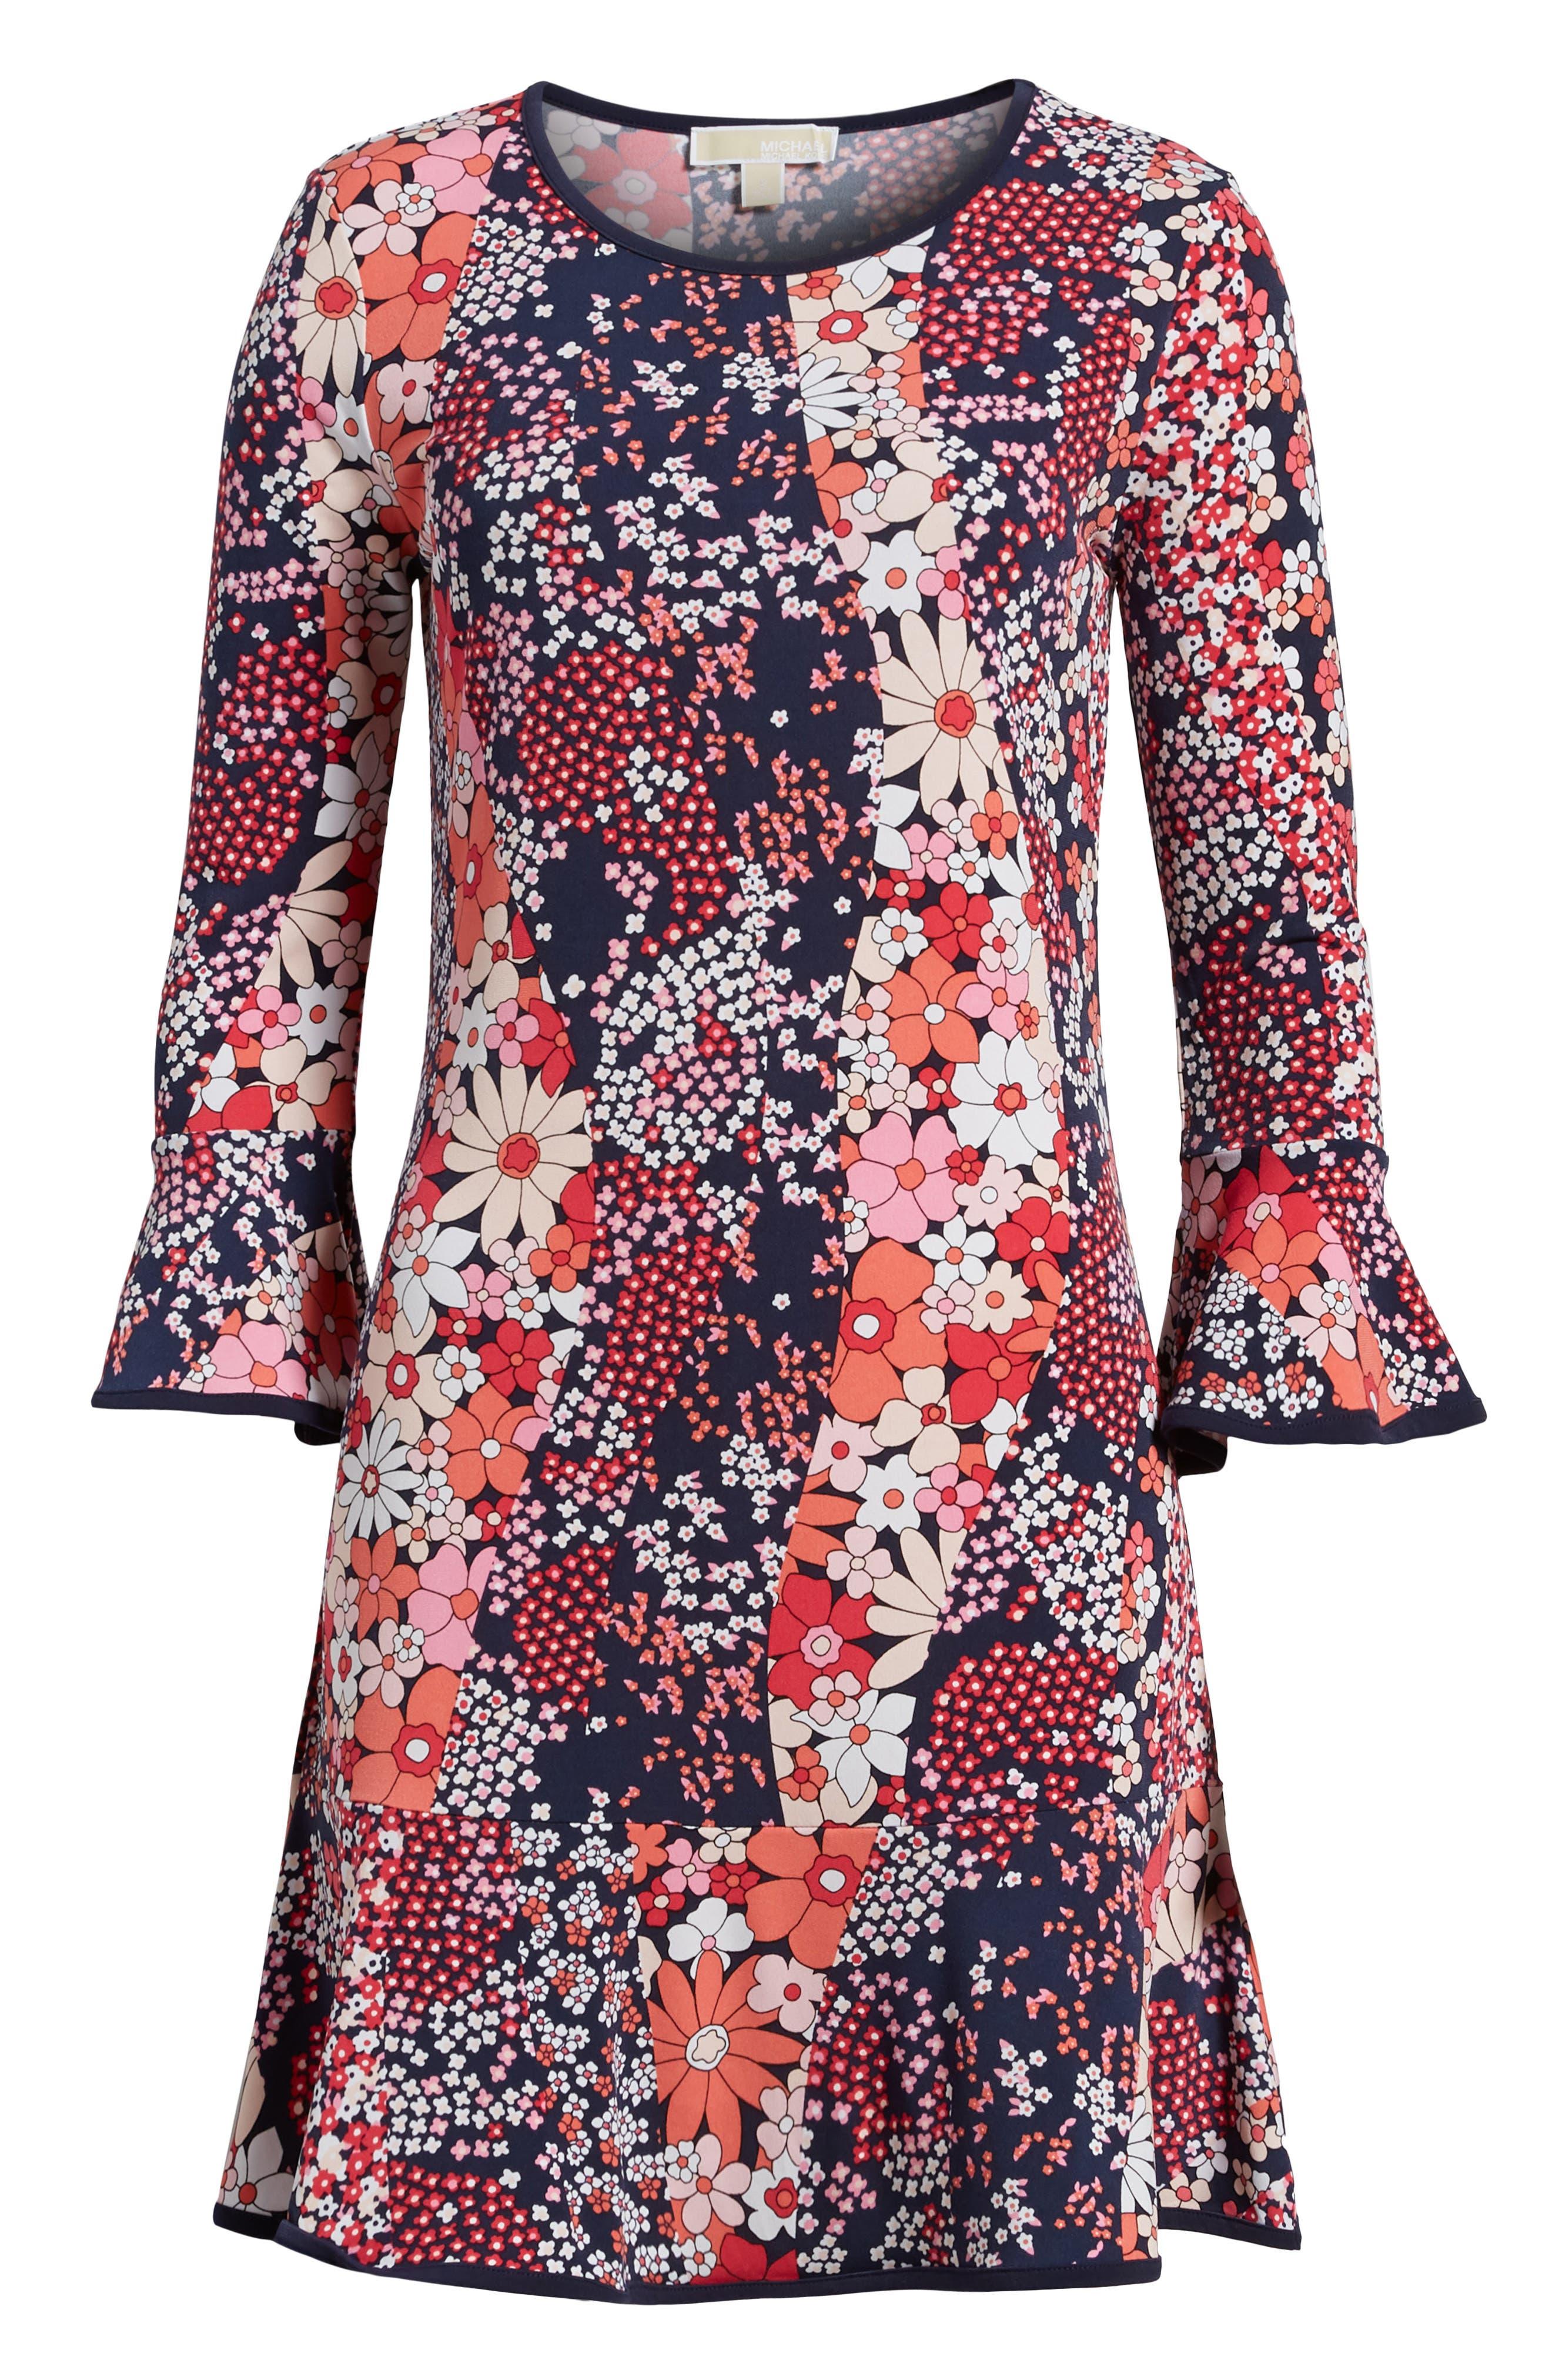 Patch Flower Flounce Dress,                             Alternate thumbnail 6, color,                             True Navy/ Bright Blush